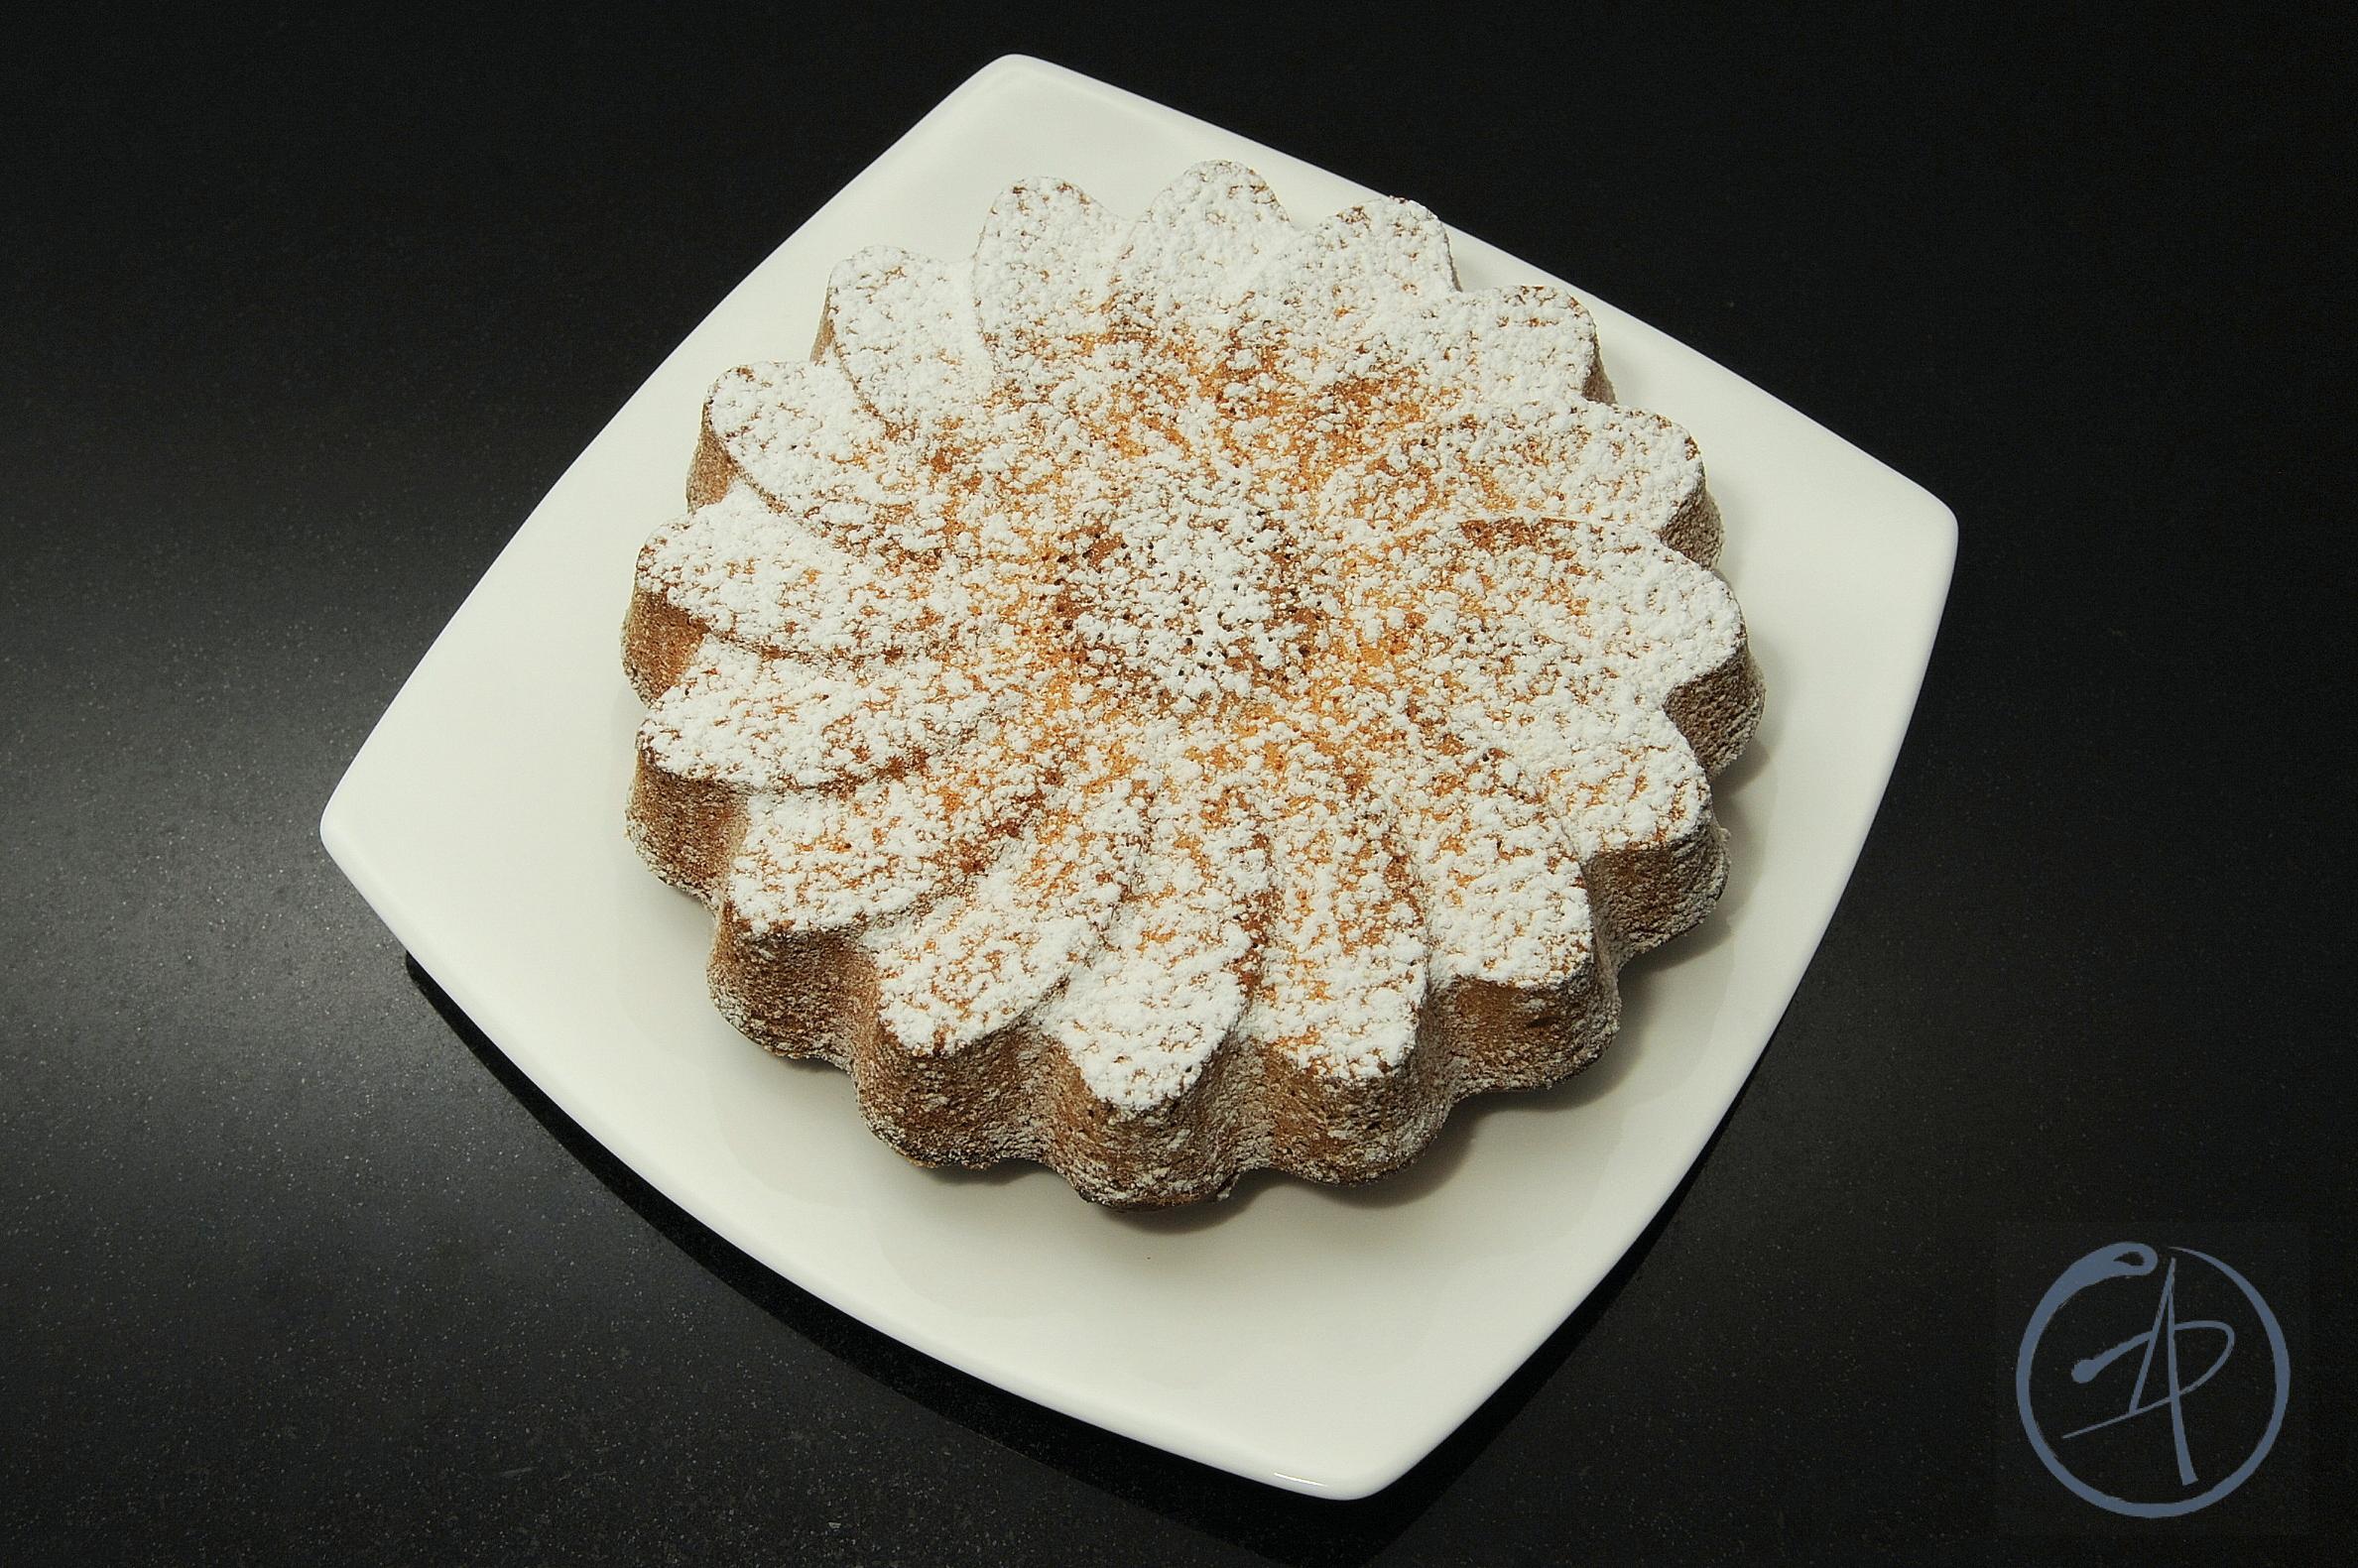 Dolci Da Credenza Alice Ricette : Dolce mathilda d. malizia ricette davide torte